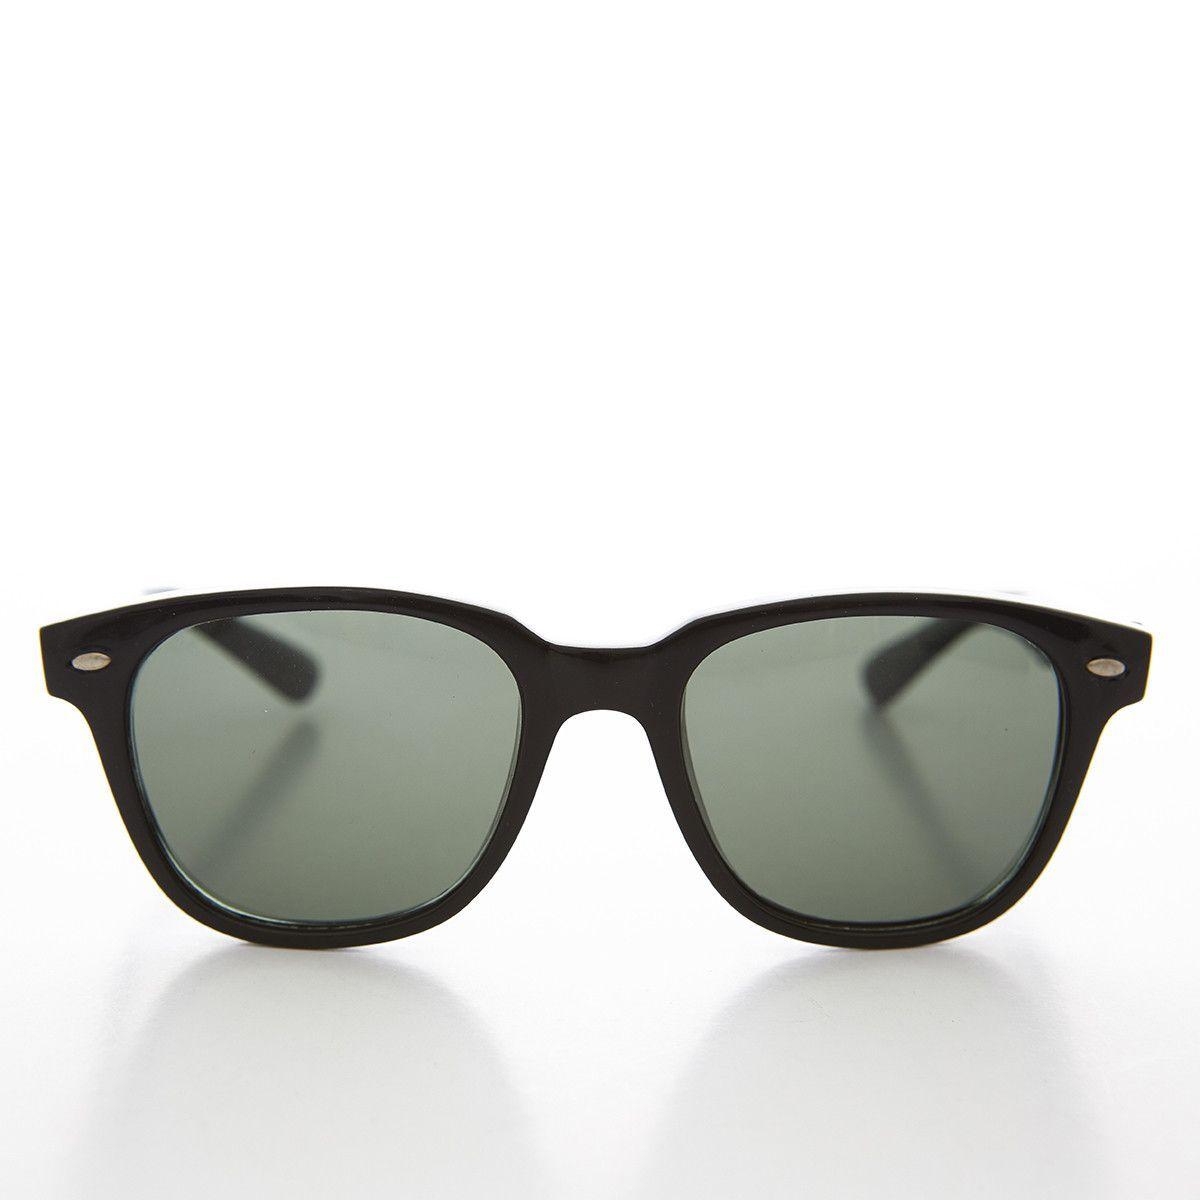 Mad Men Wayfarer 1960s Style Vintage Sunglass with Glass Lens NOS -HARPER